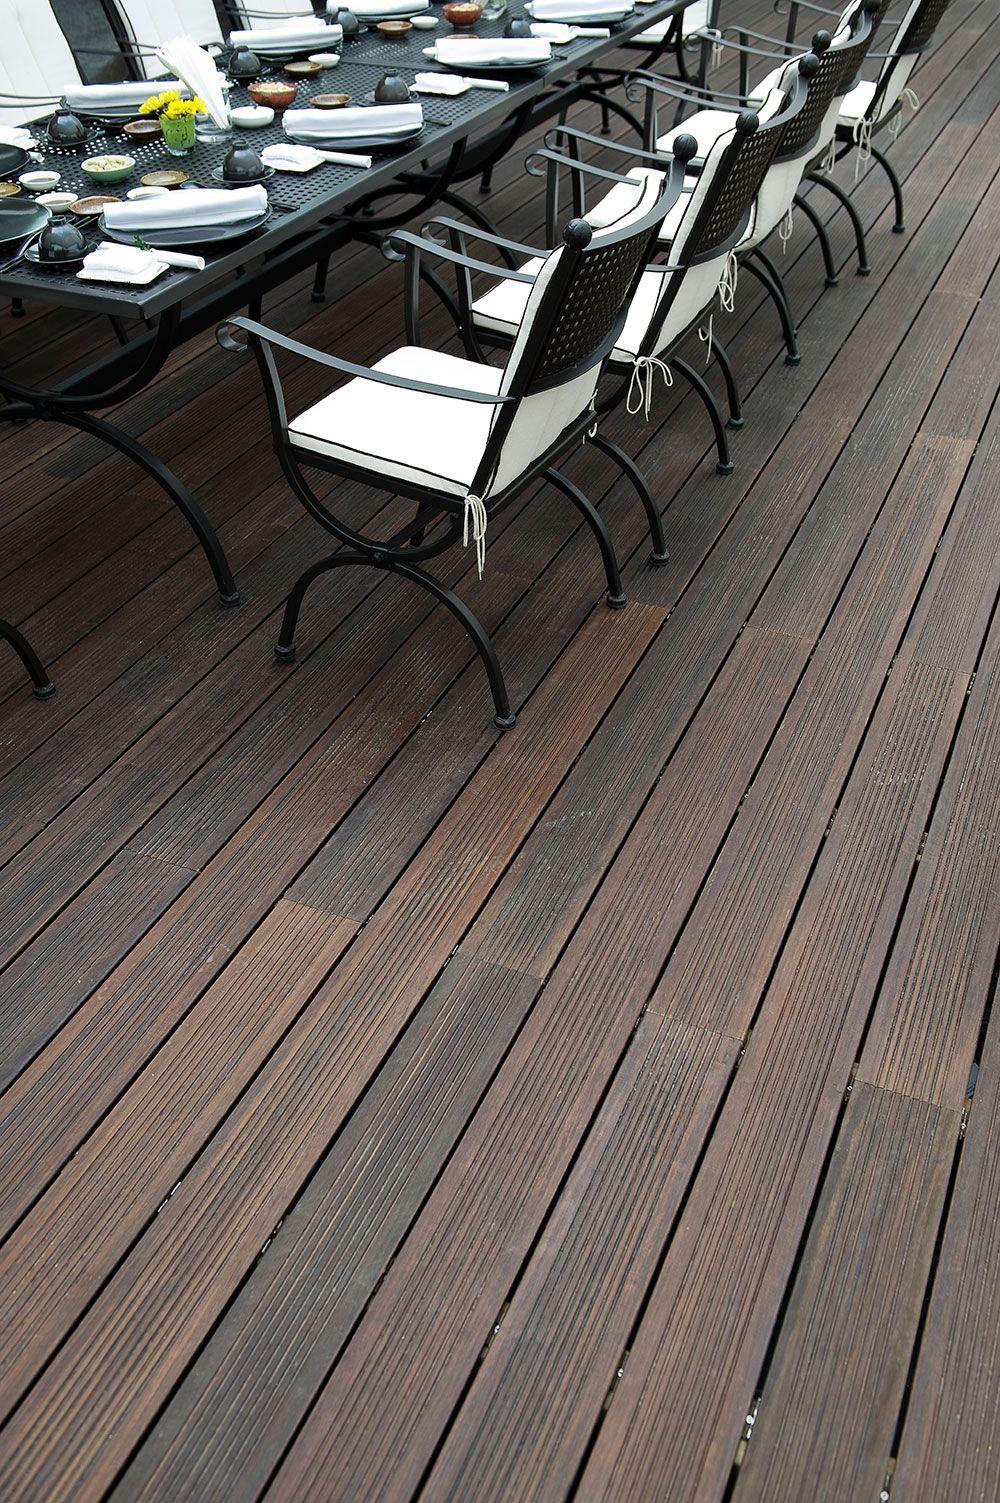 Bamboo decking from dasso XTR | DassoXTR Decking | Bamboo